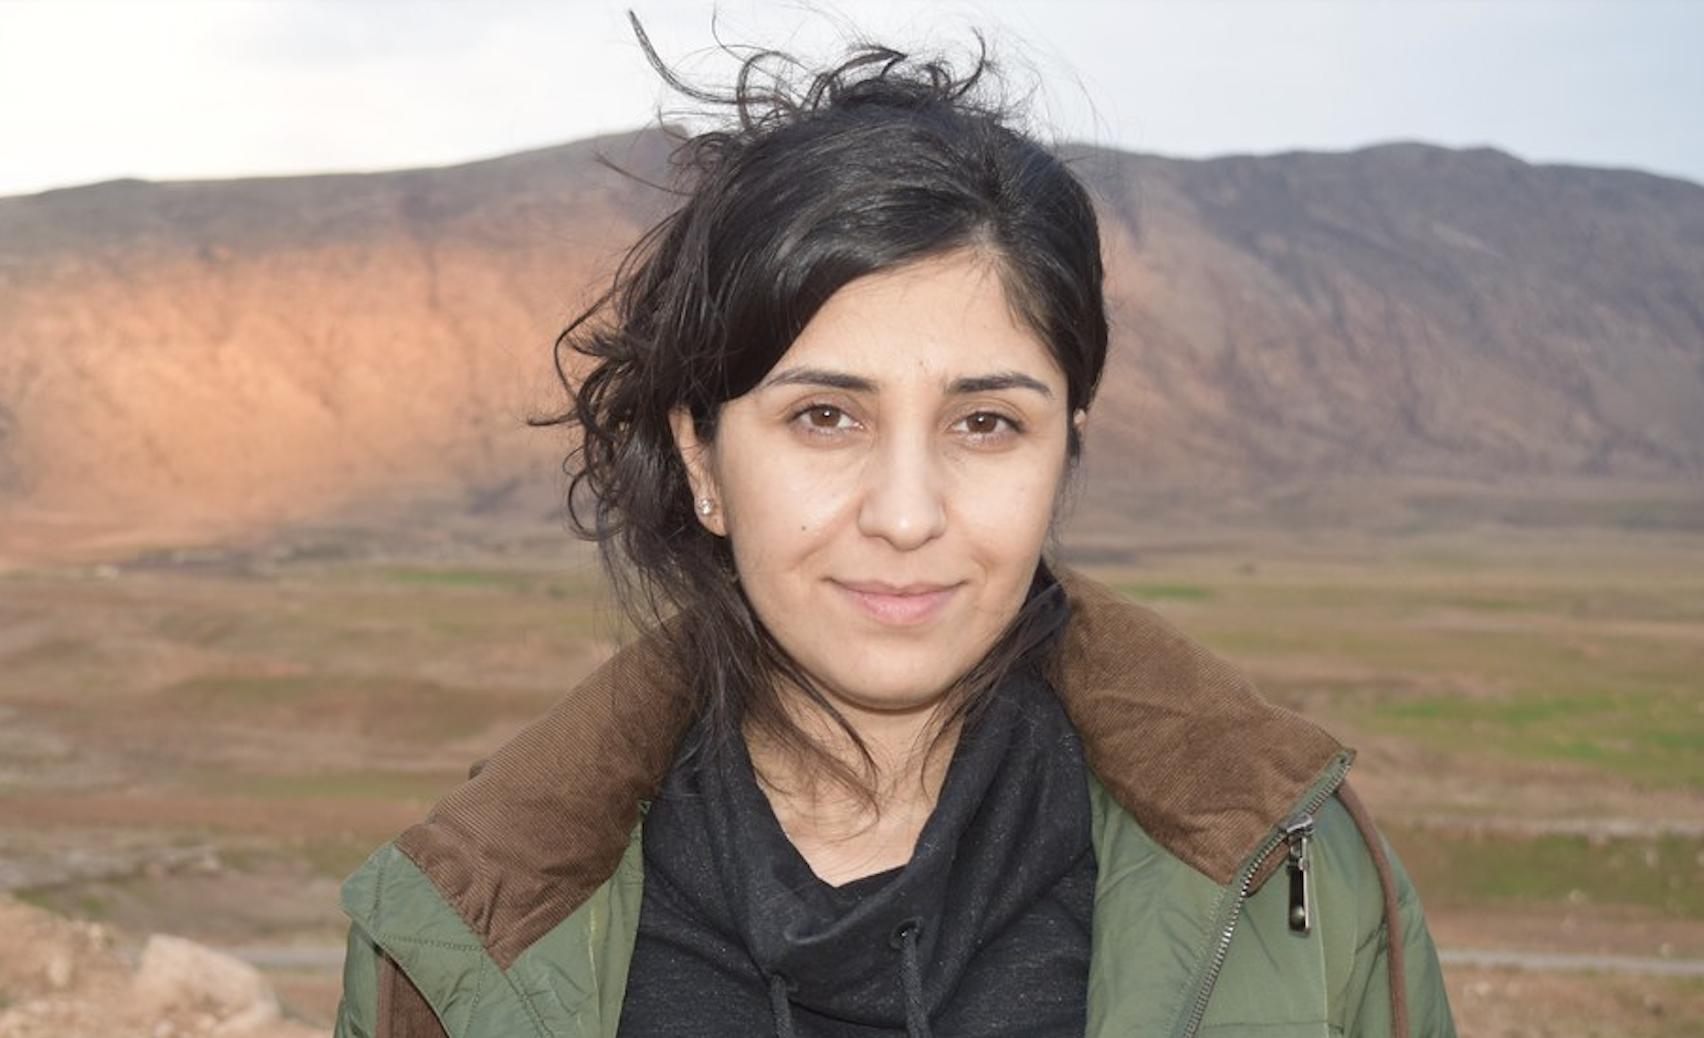 هنا رضا.. ناشطة كوردية تسلك درباً شاقاً لإنقاذ فهود كوردستان